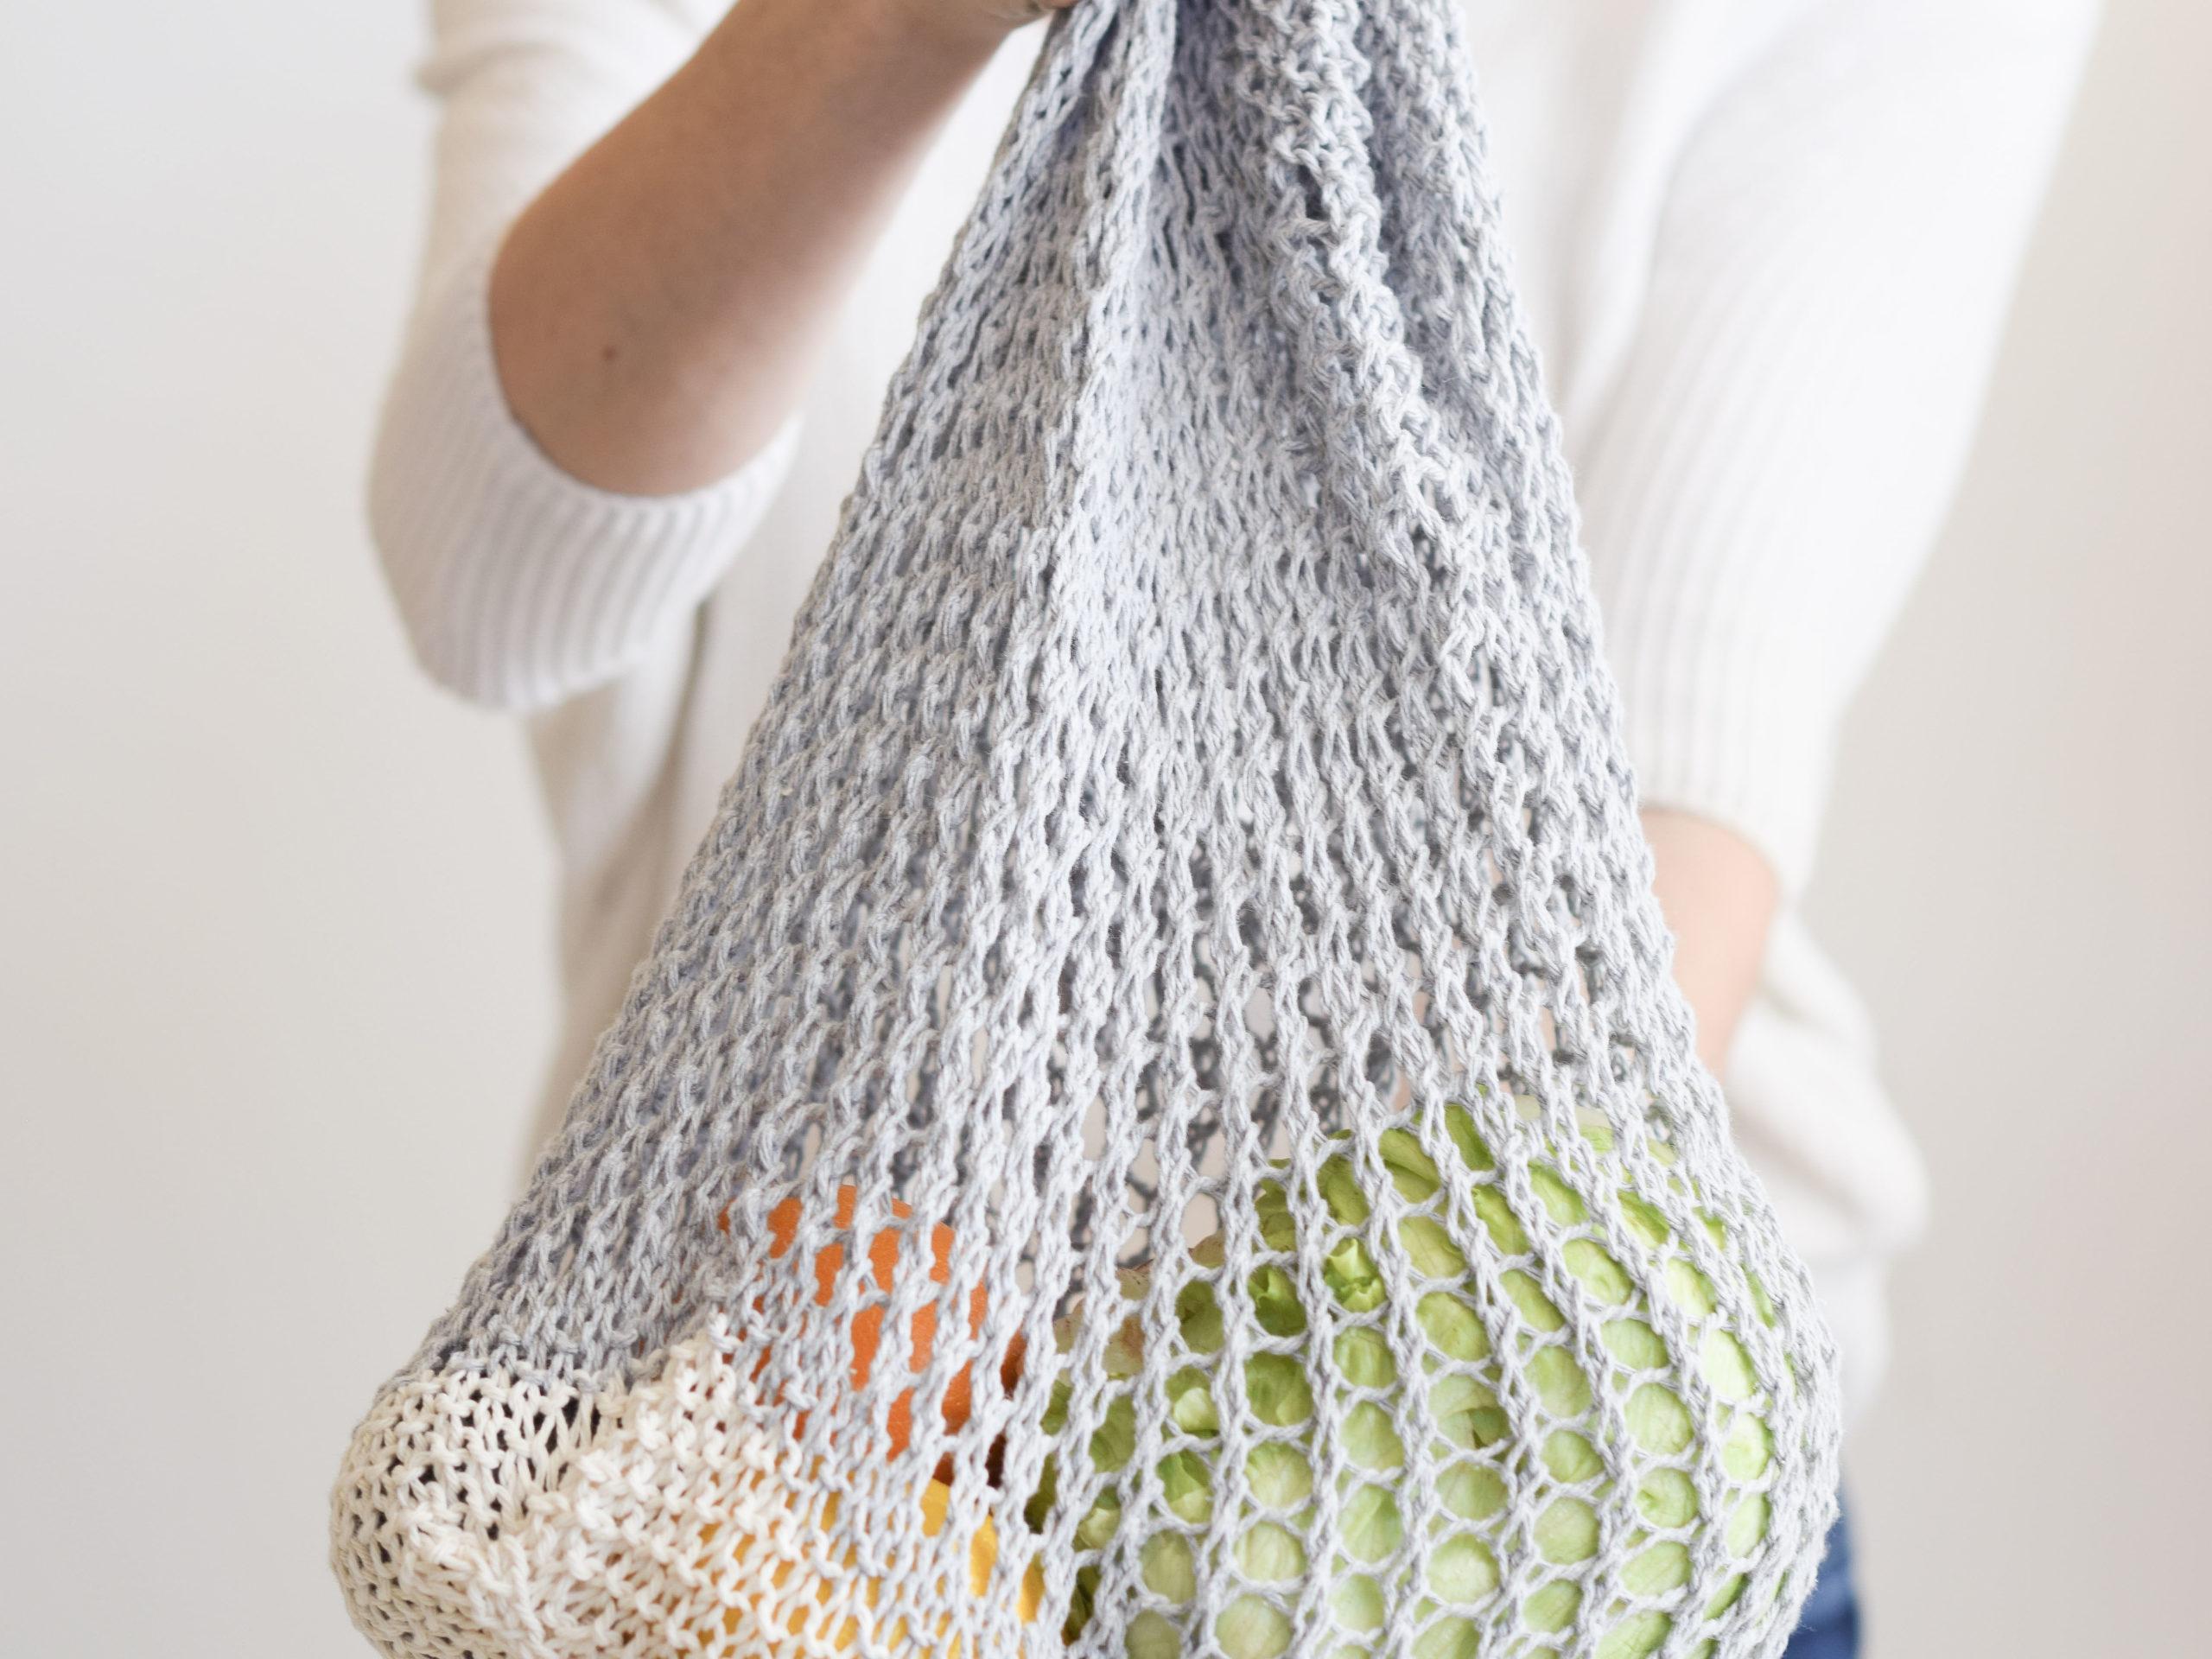 Instant Download Farmer/'s Market Bag Knit Pattern Intermediate Knitting Pattern DIY Knit Project